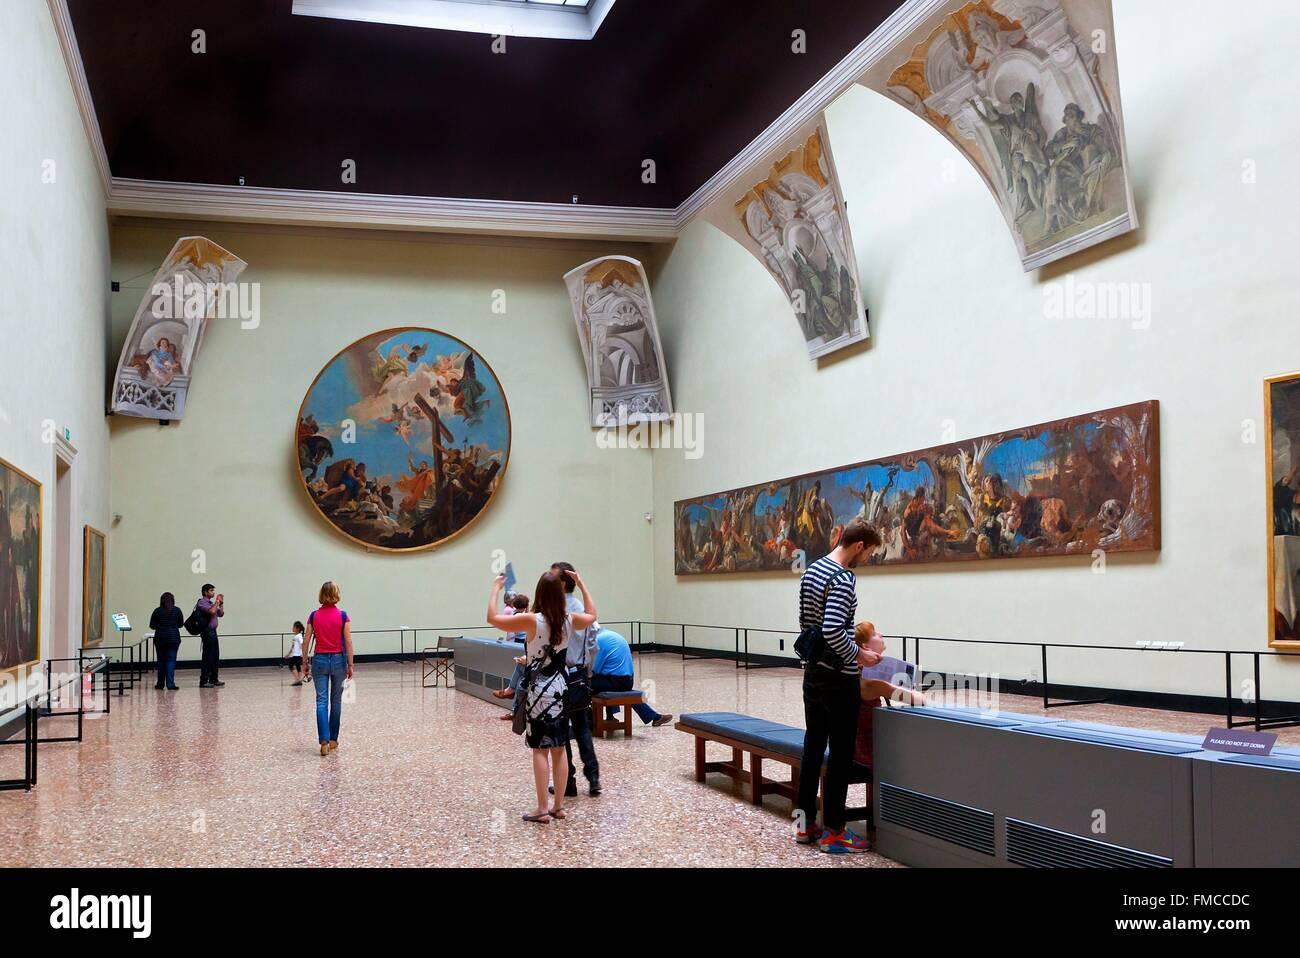 Italy, Veneto, Venice, Accademia Gallery in Venice - Stock Image